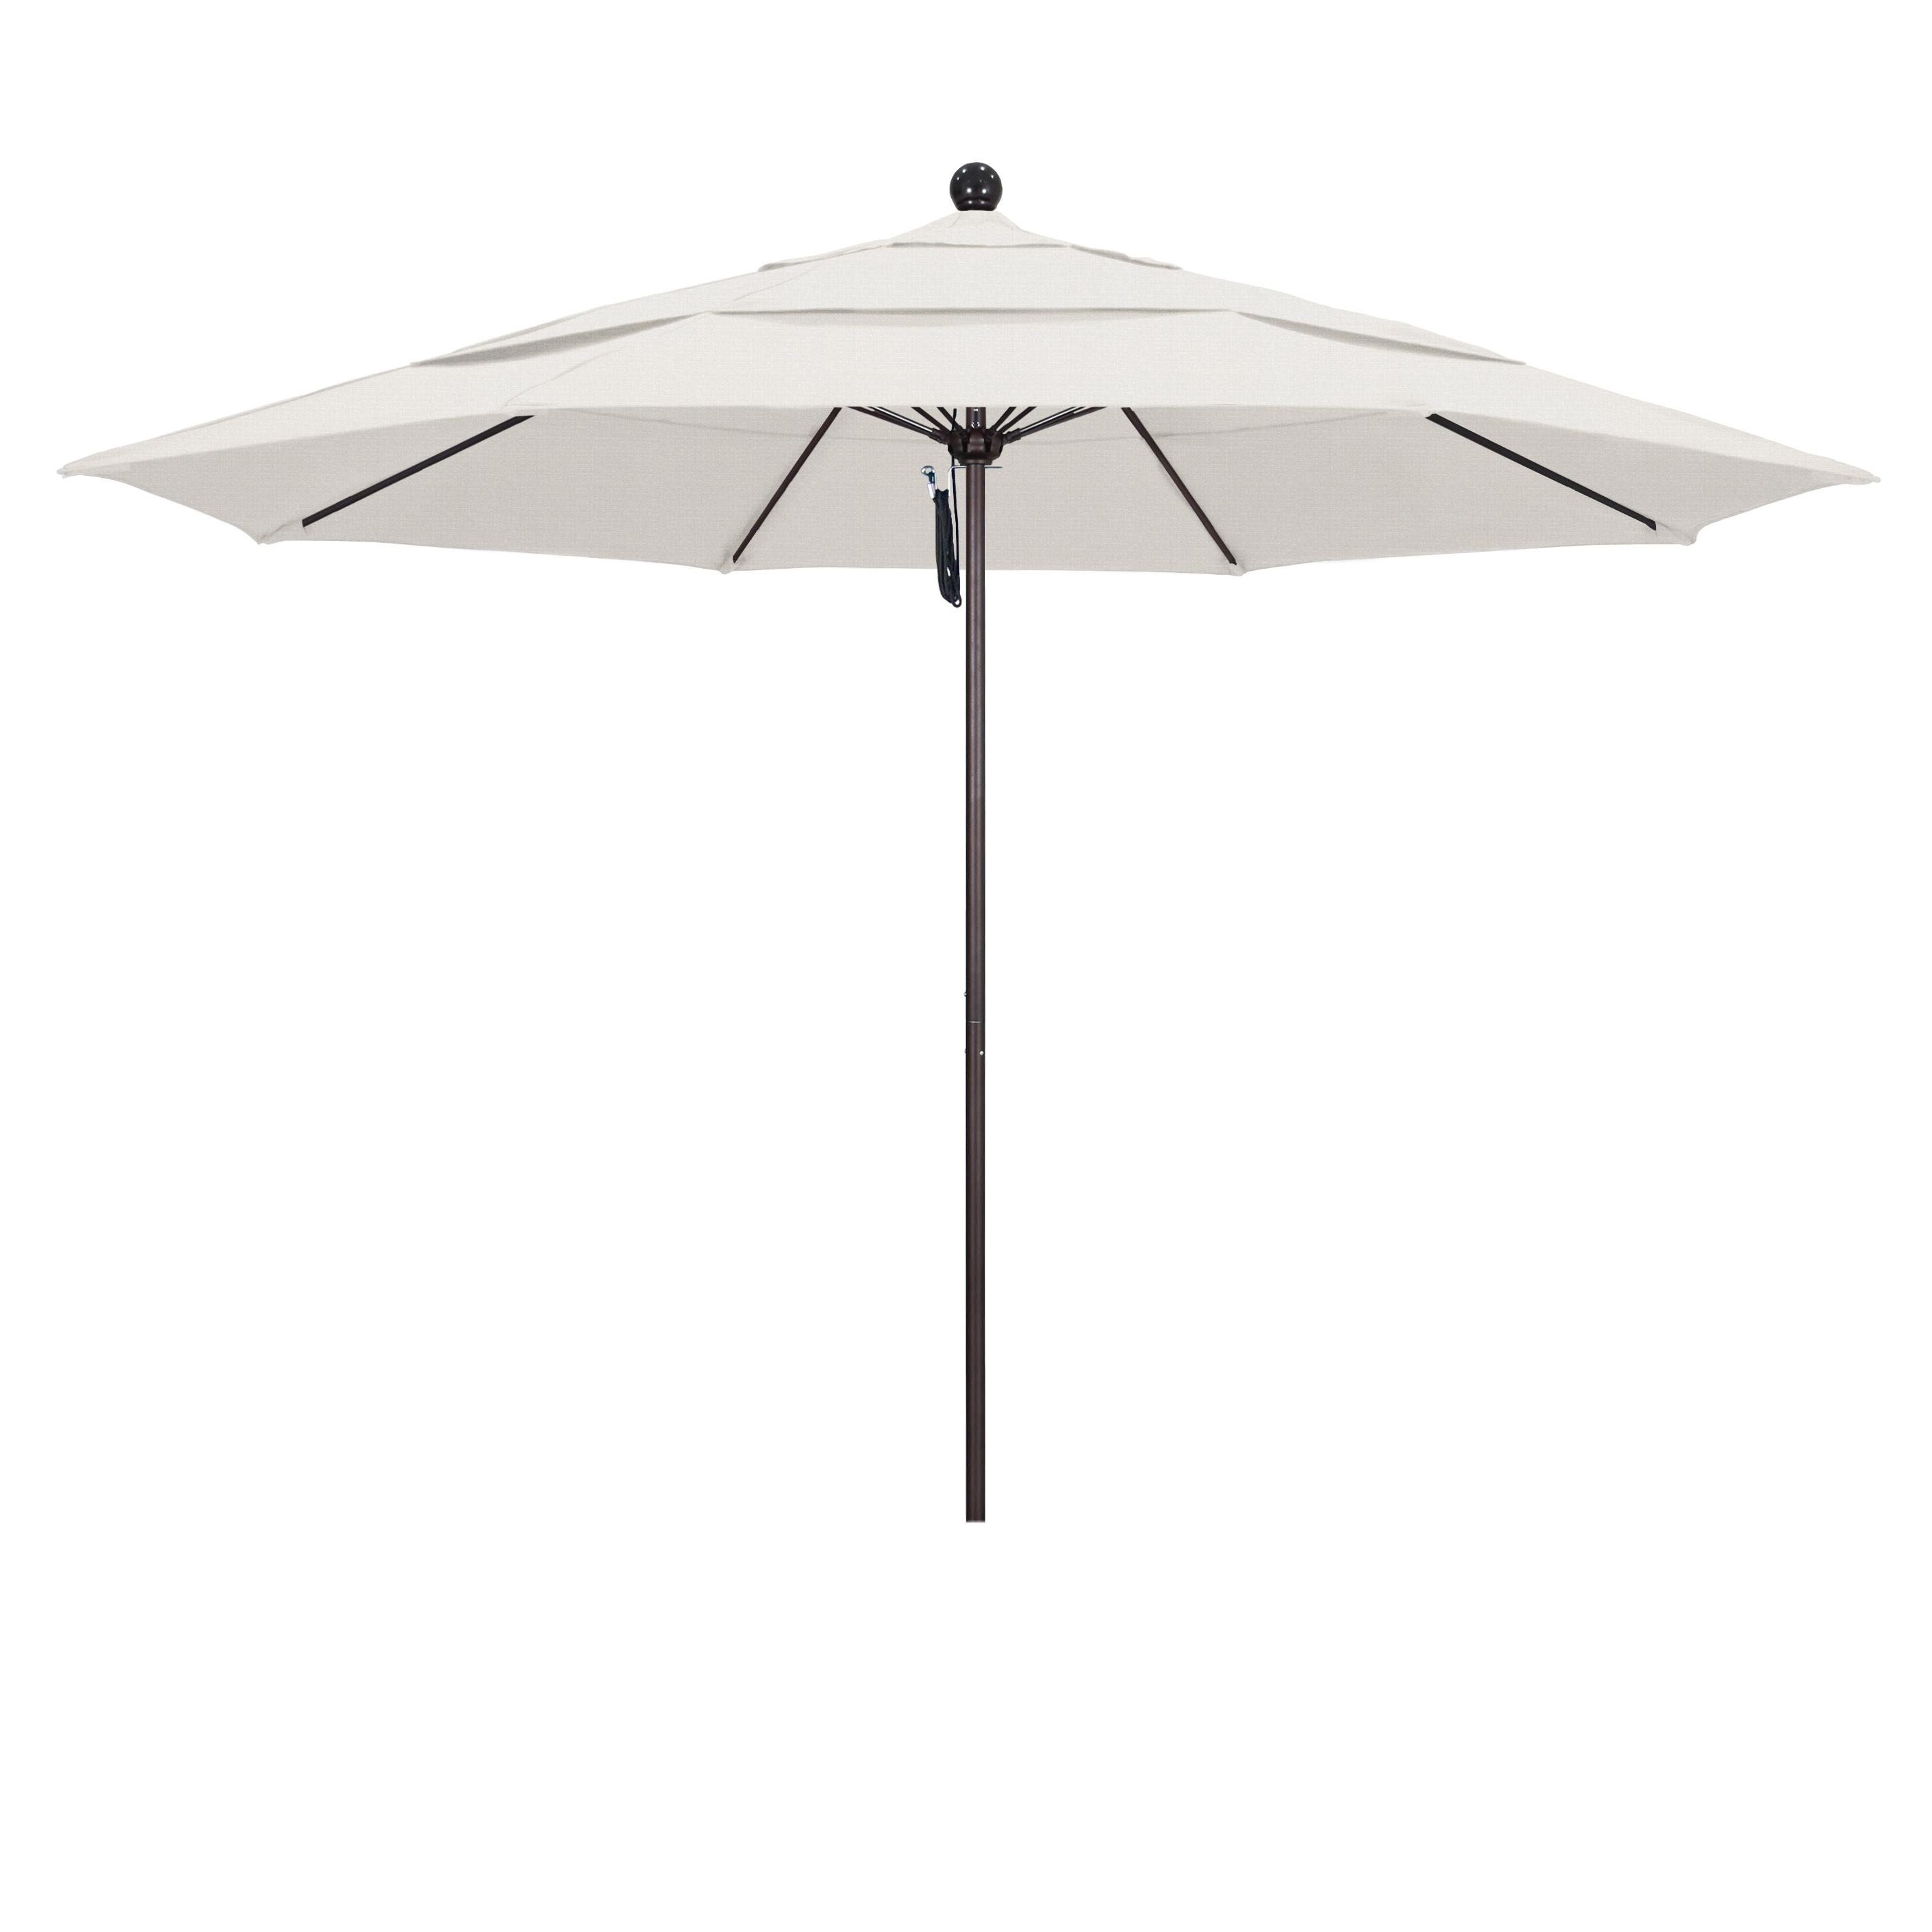 Most Popular Davenport 11' Market Umbrella Pertaining To Caravelle Market Umbrellas (Gallery 13 of 20)